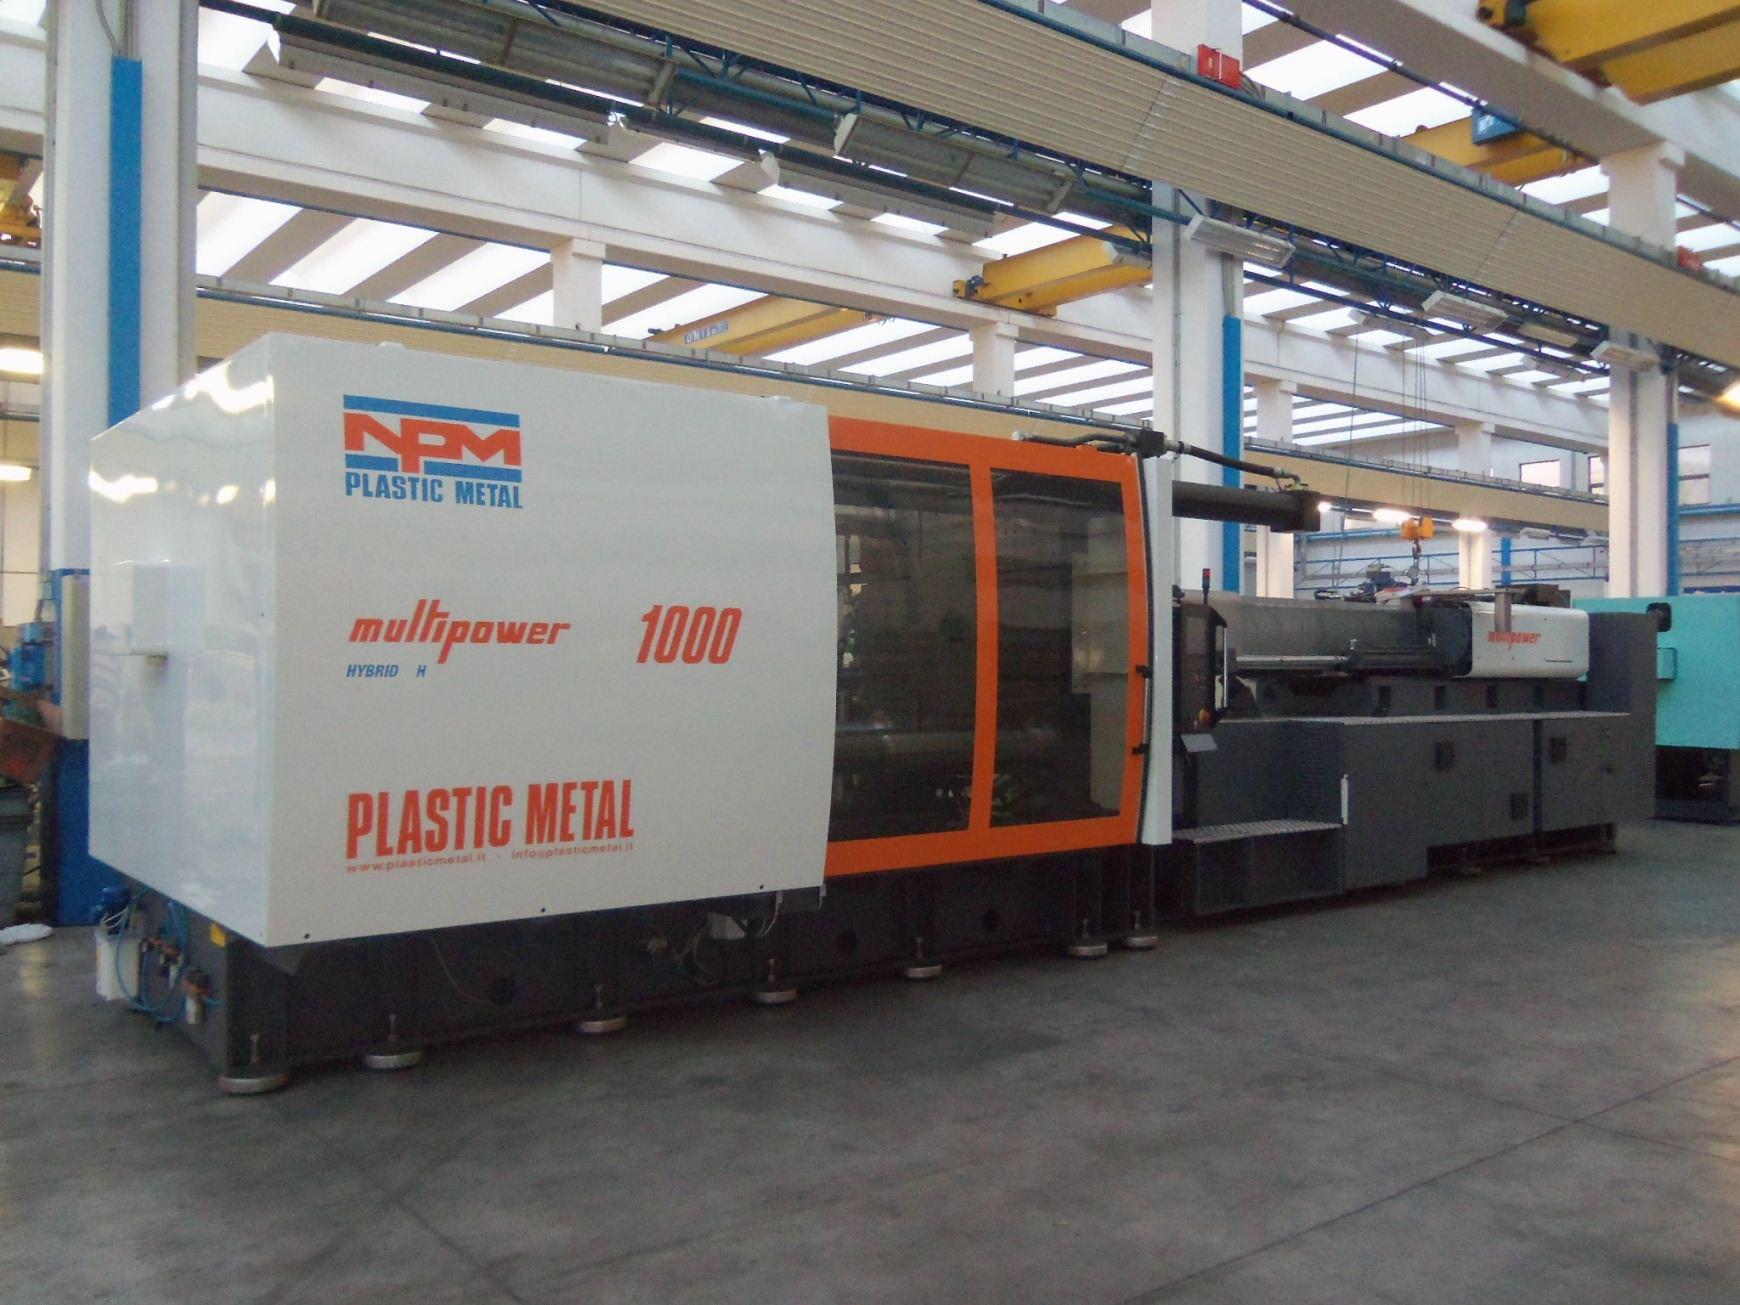 Plastic-Metal-Multi-Power-1000